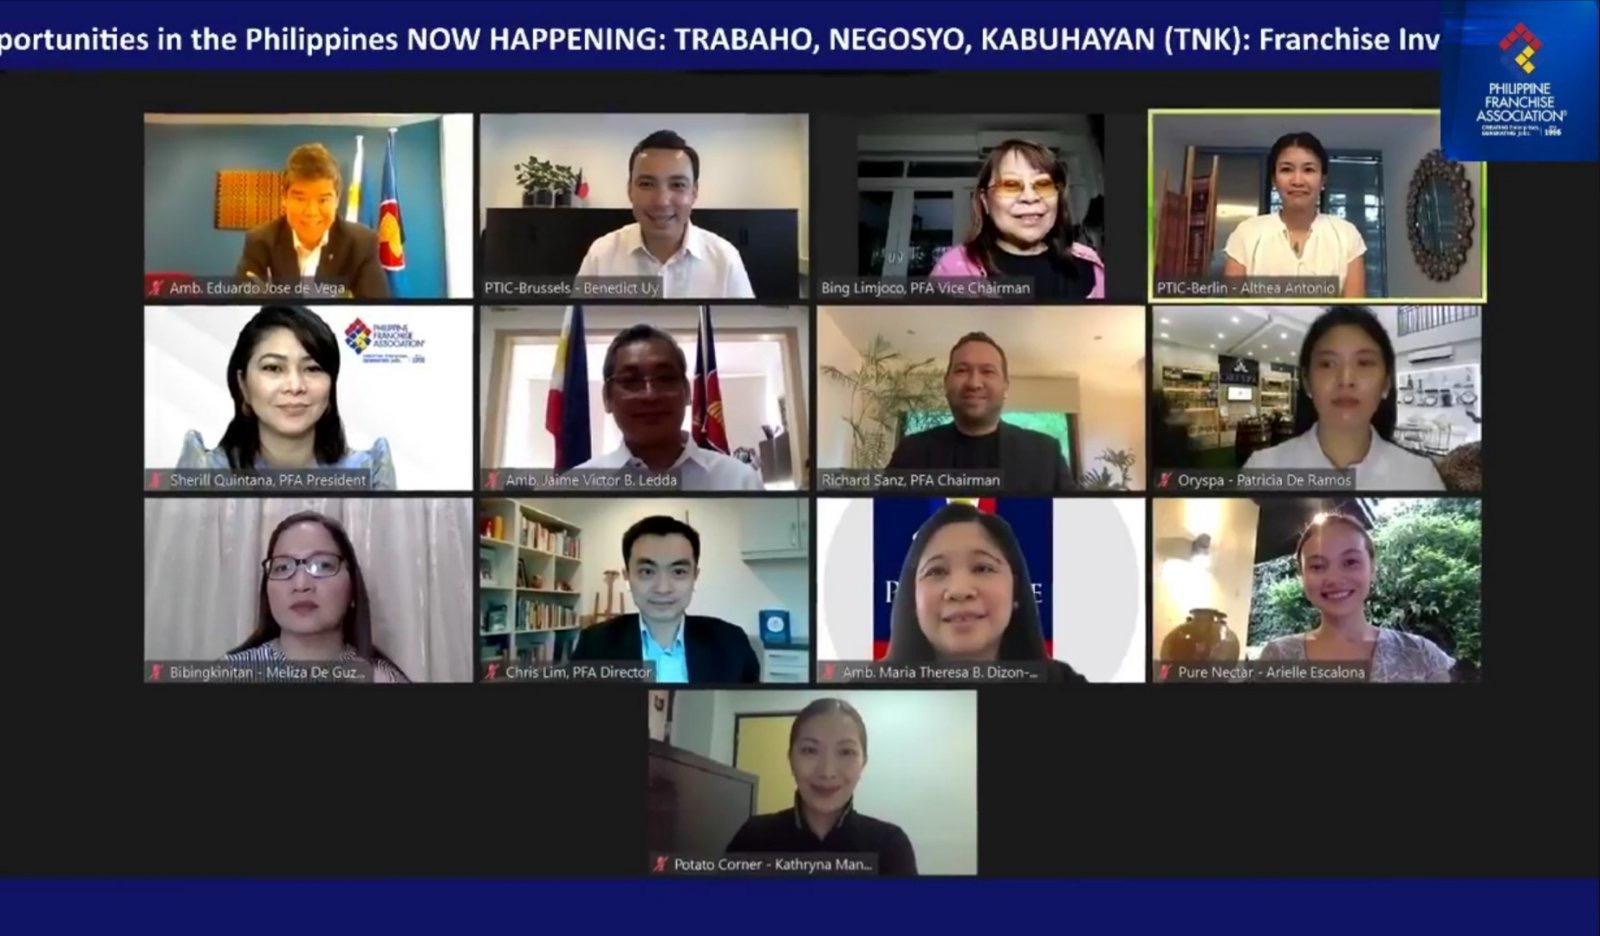 Filipino Community Members in Germany Join TNK Franchising Webinar